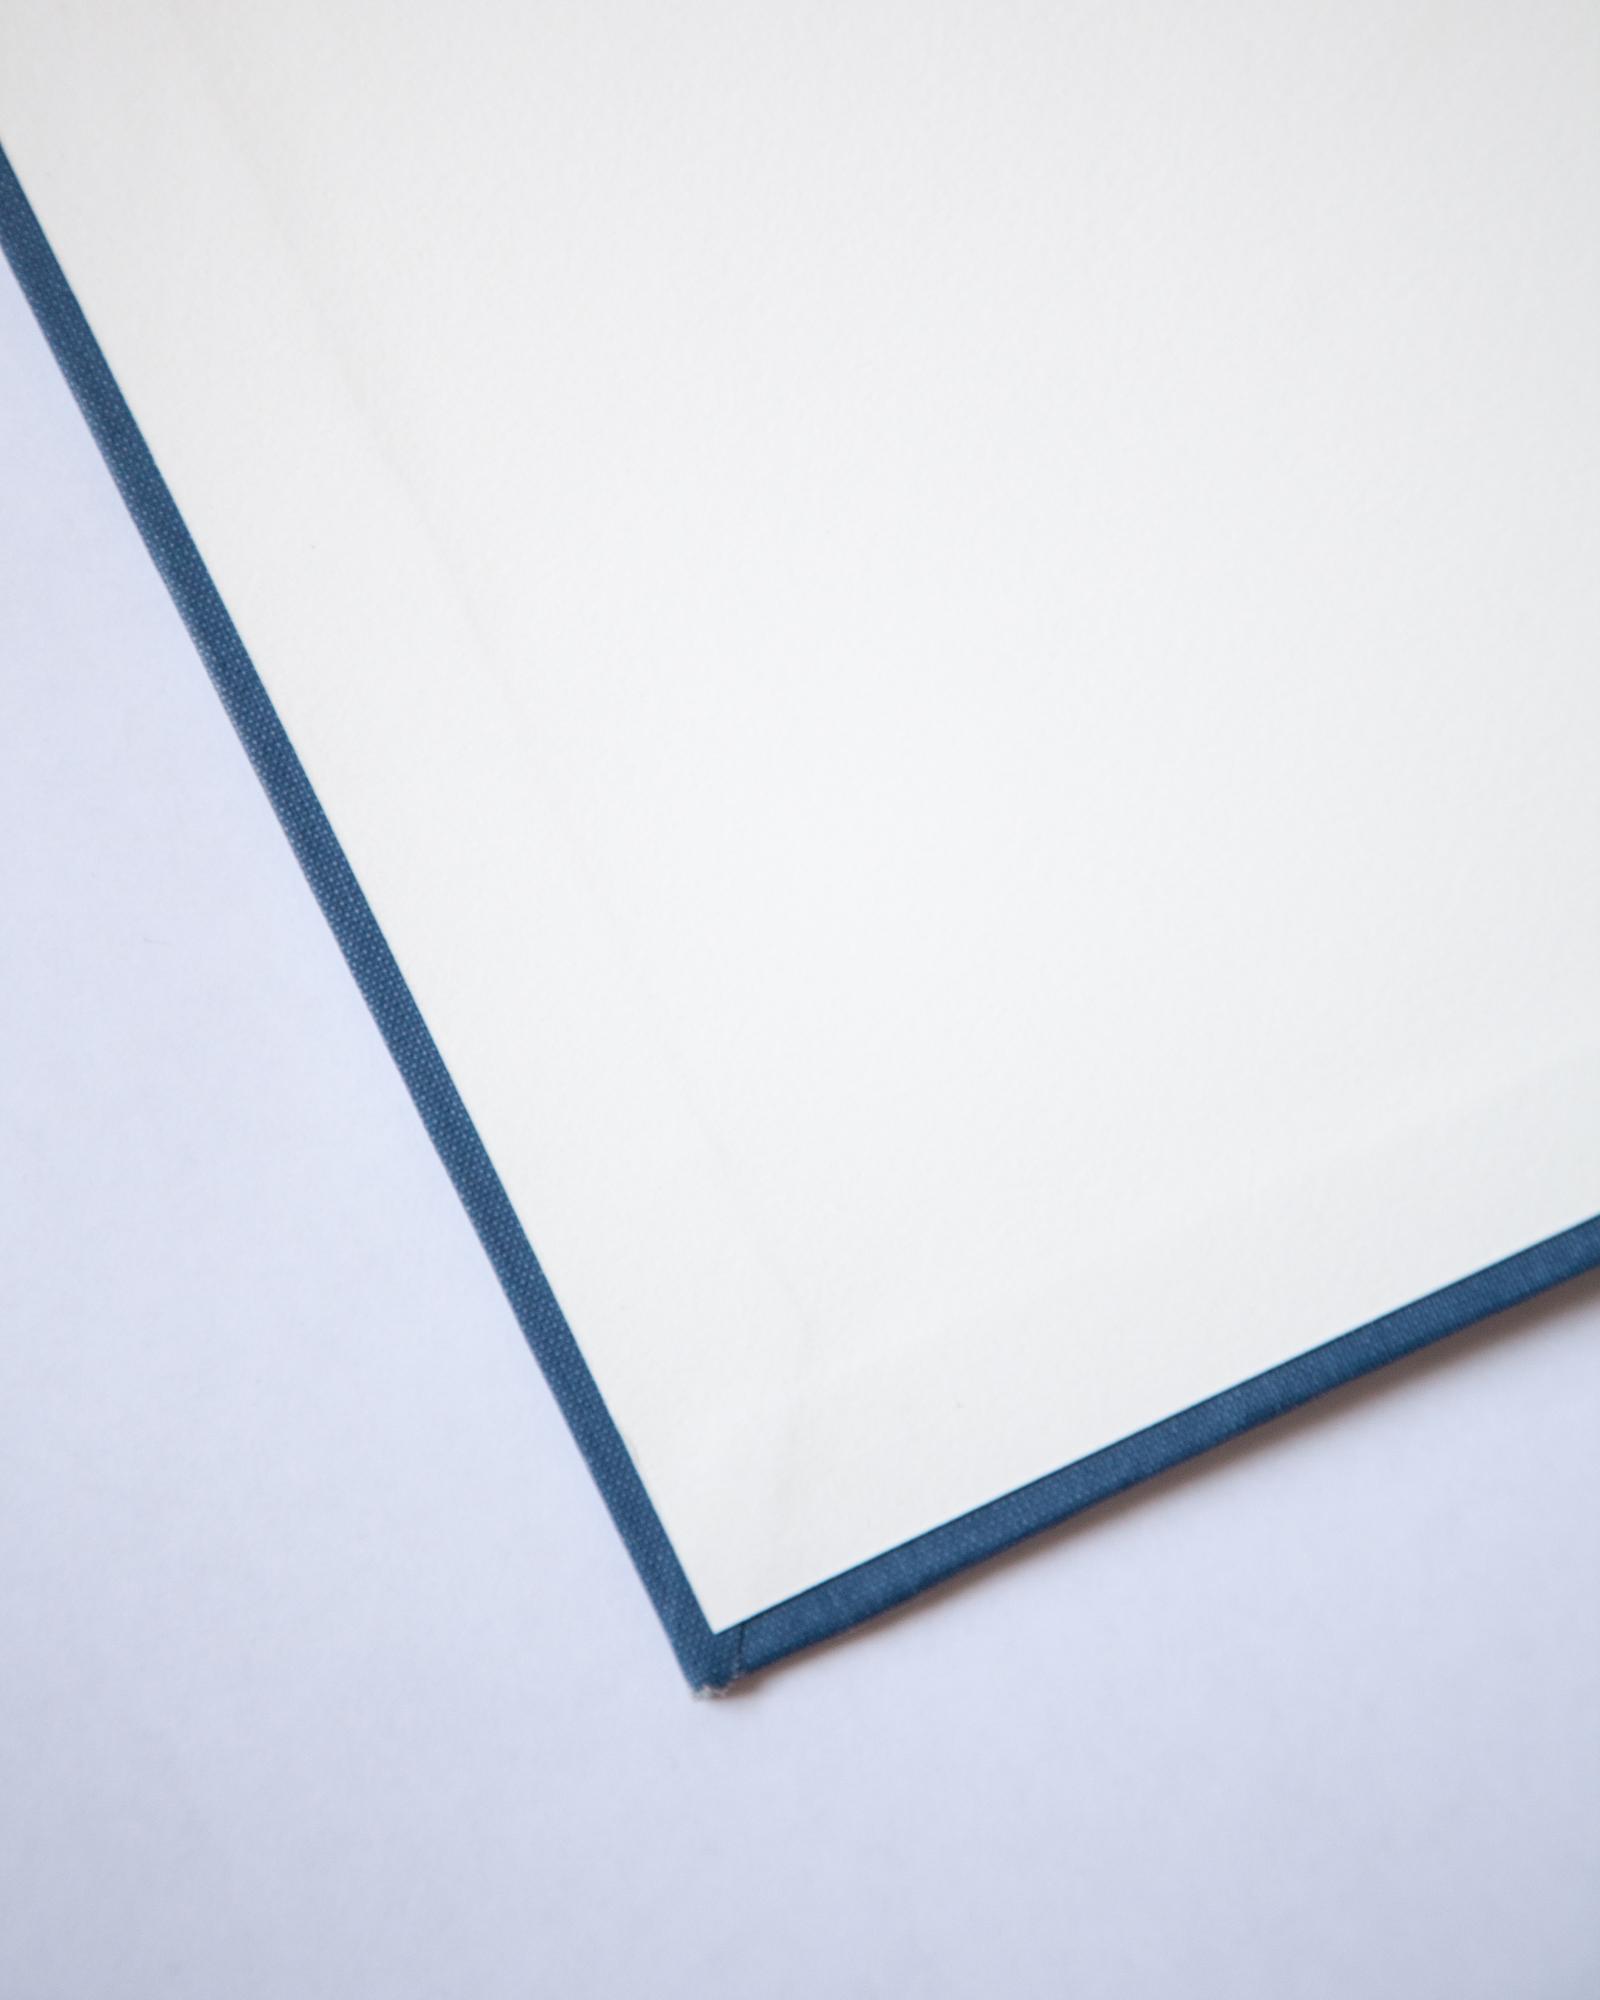 Albatross Book-005.jpg